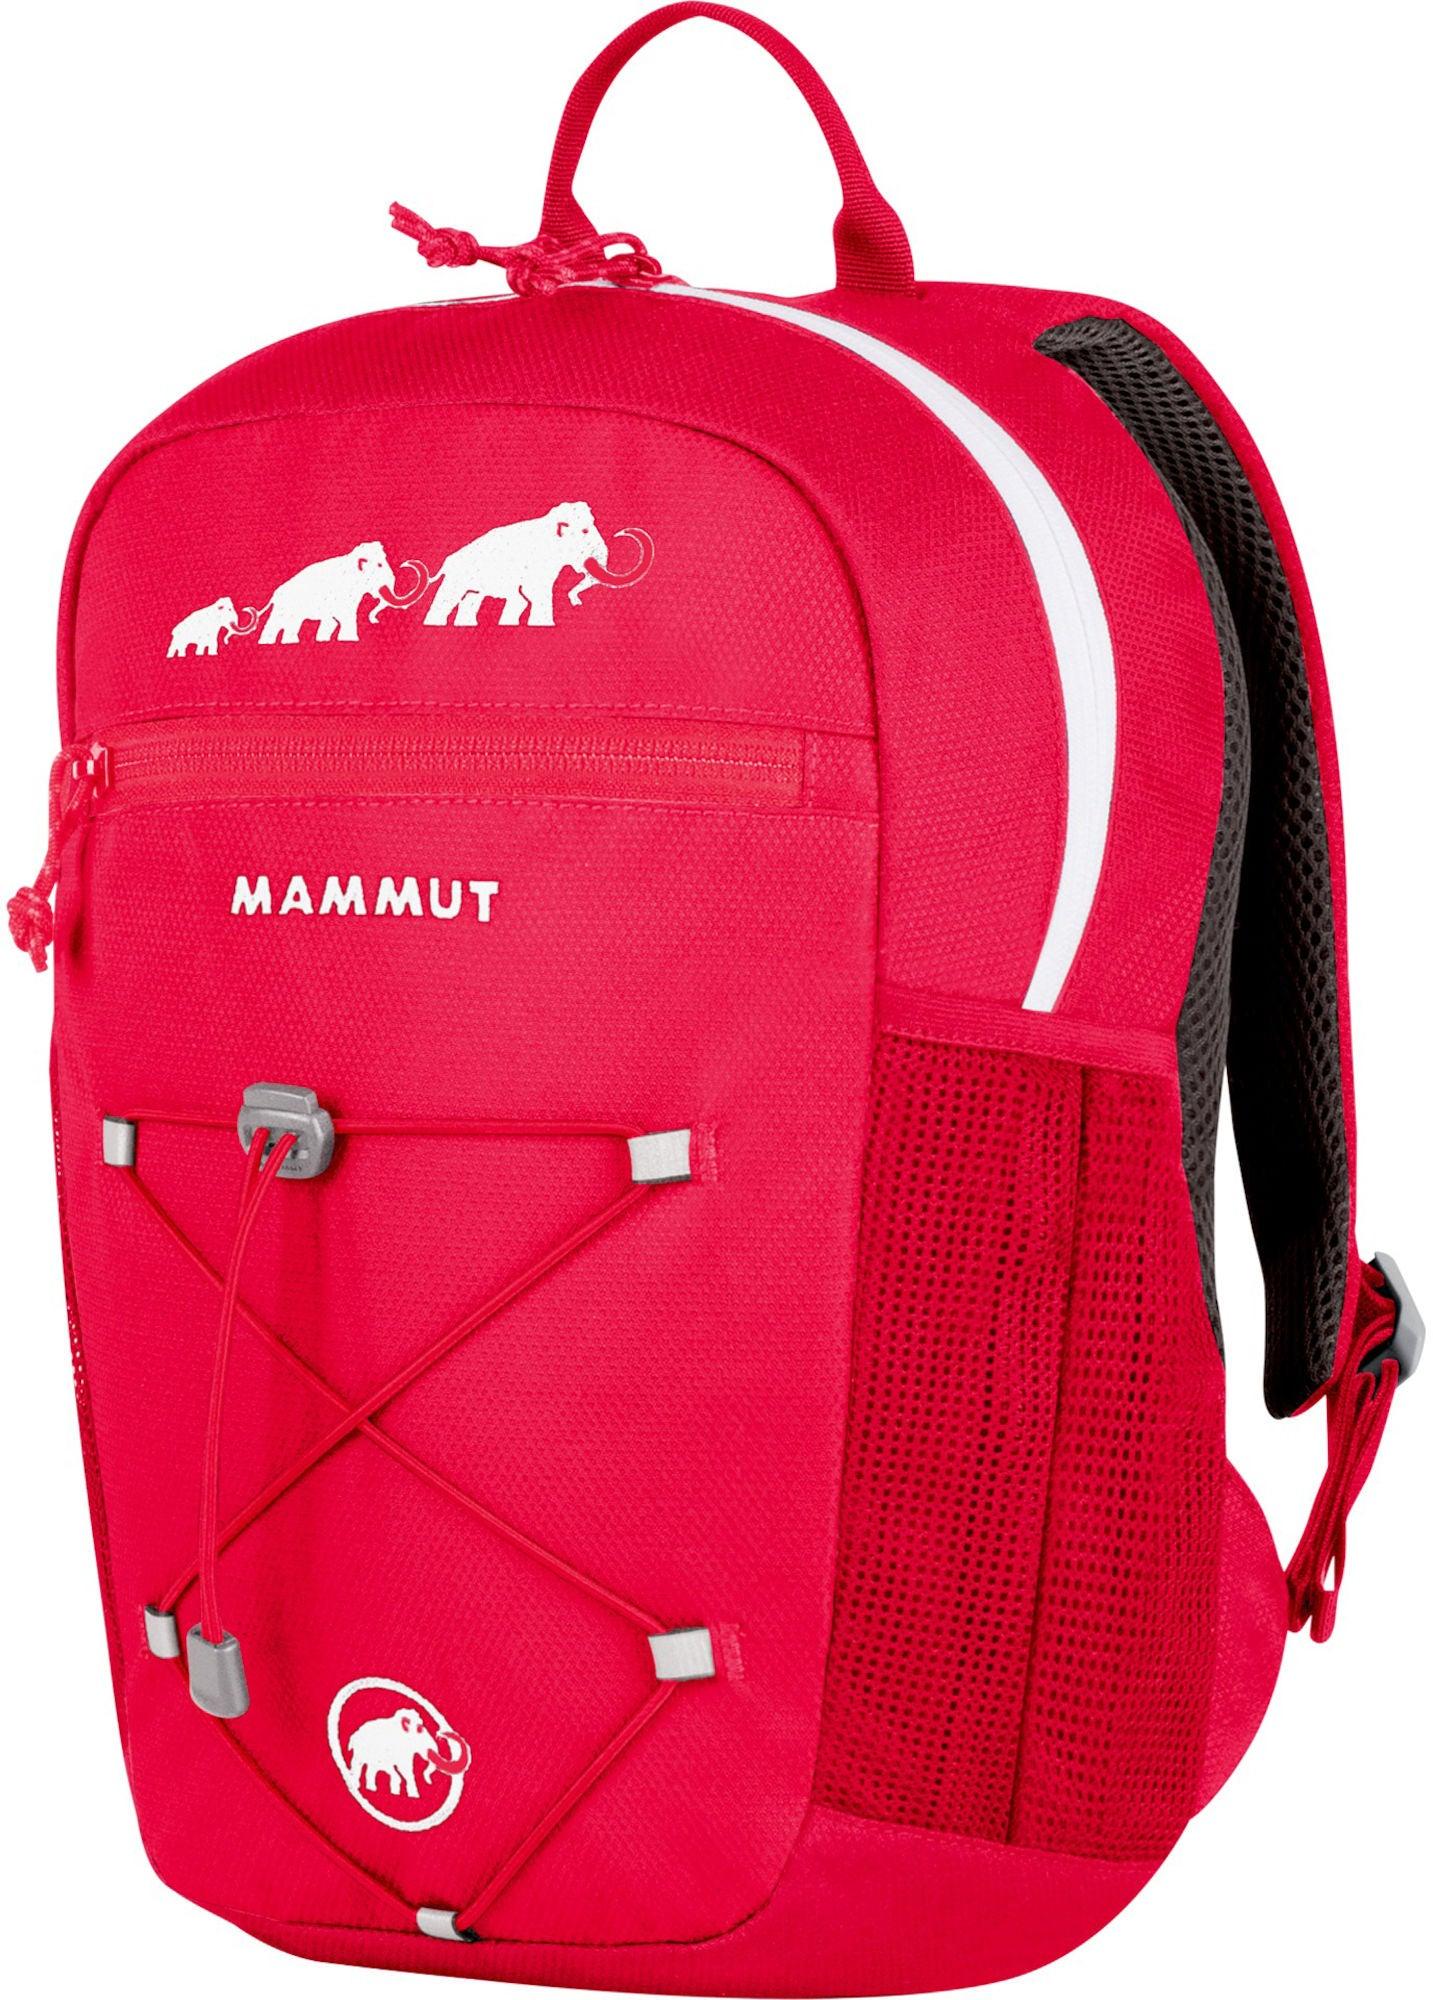 Mammut First Zip Ryggsekk 16L, Light Carmine